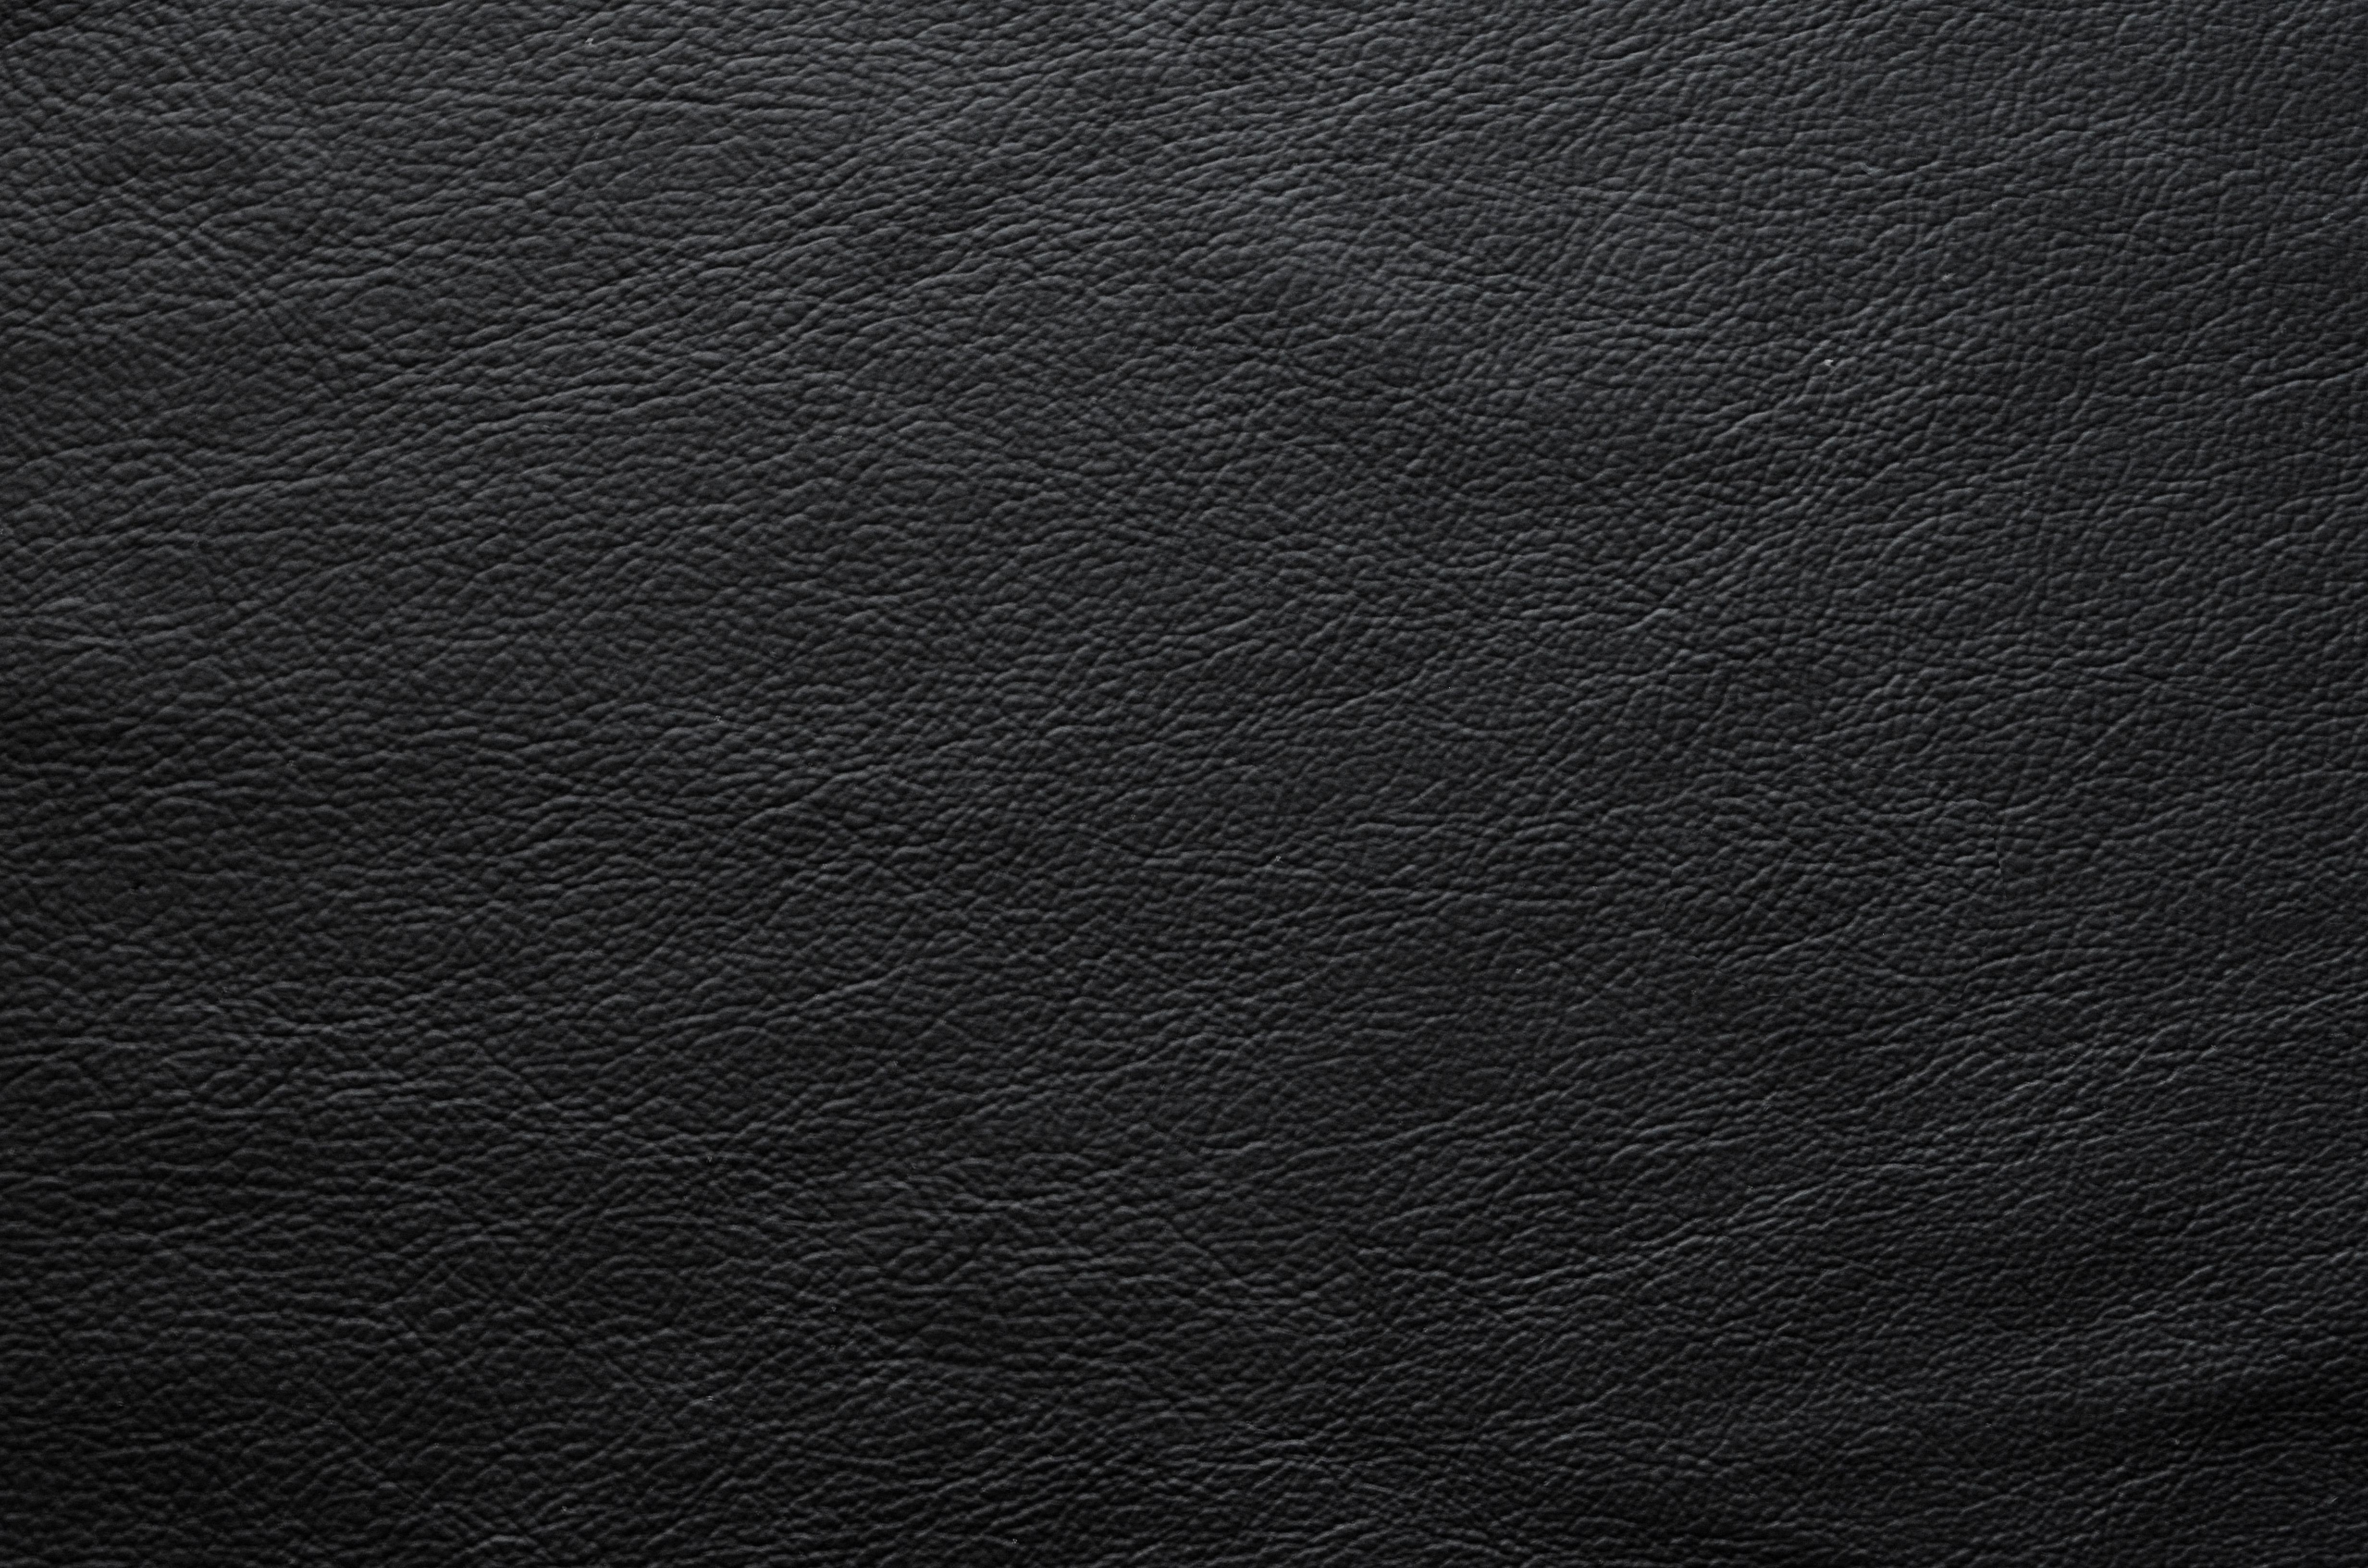 Paragon preto - clique para ampliar